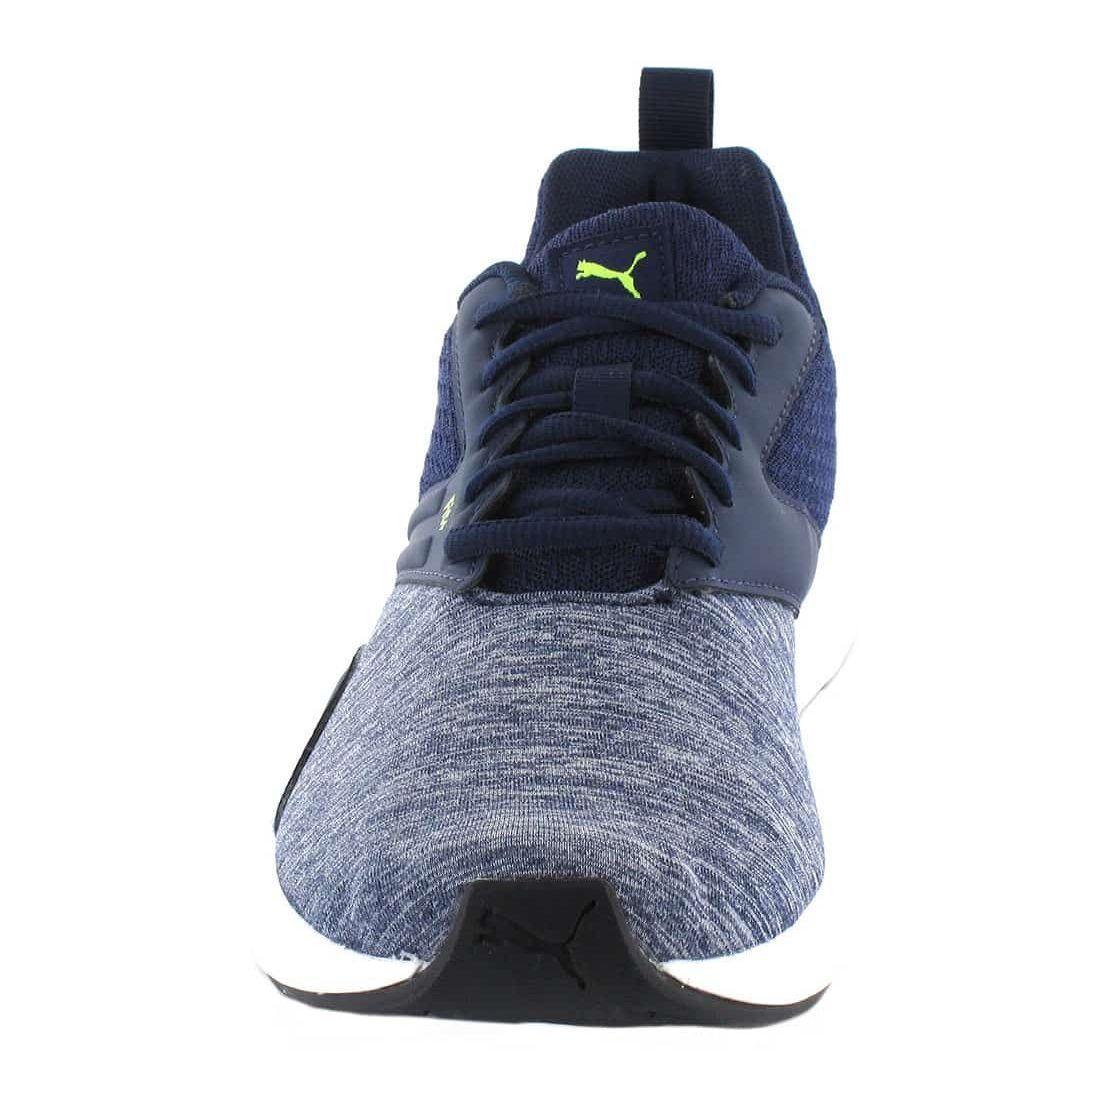 Puma running shoes NRGY Comet Blue